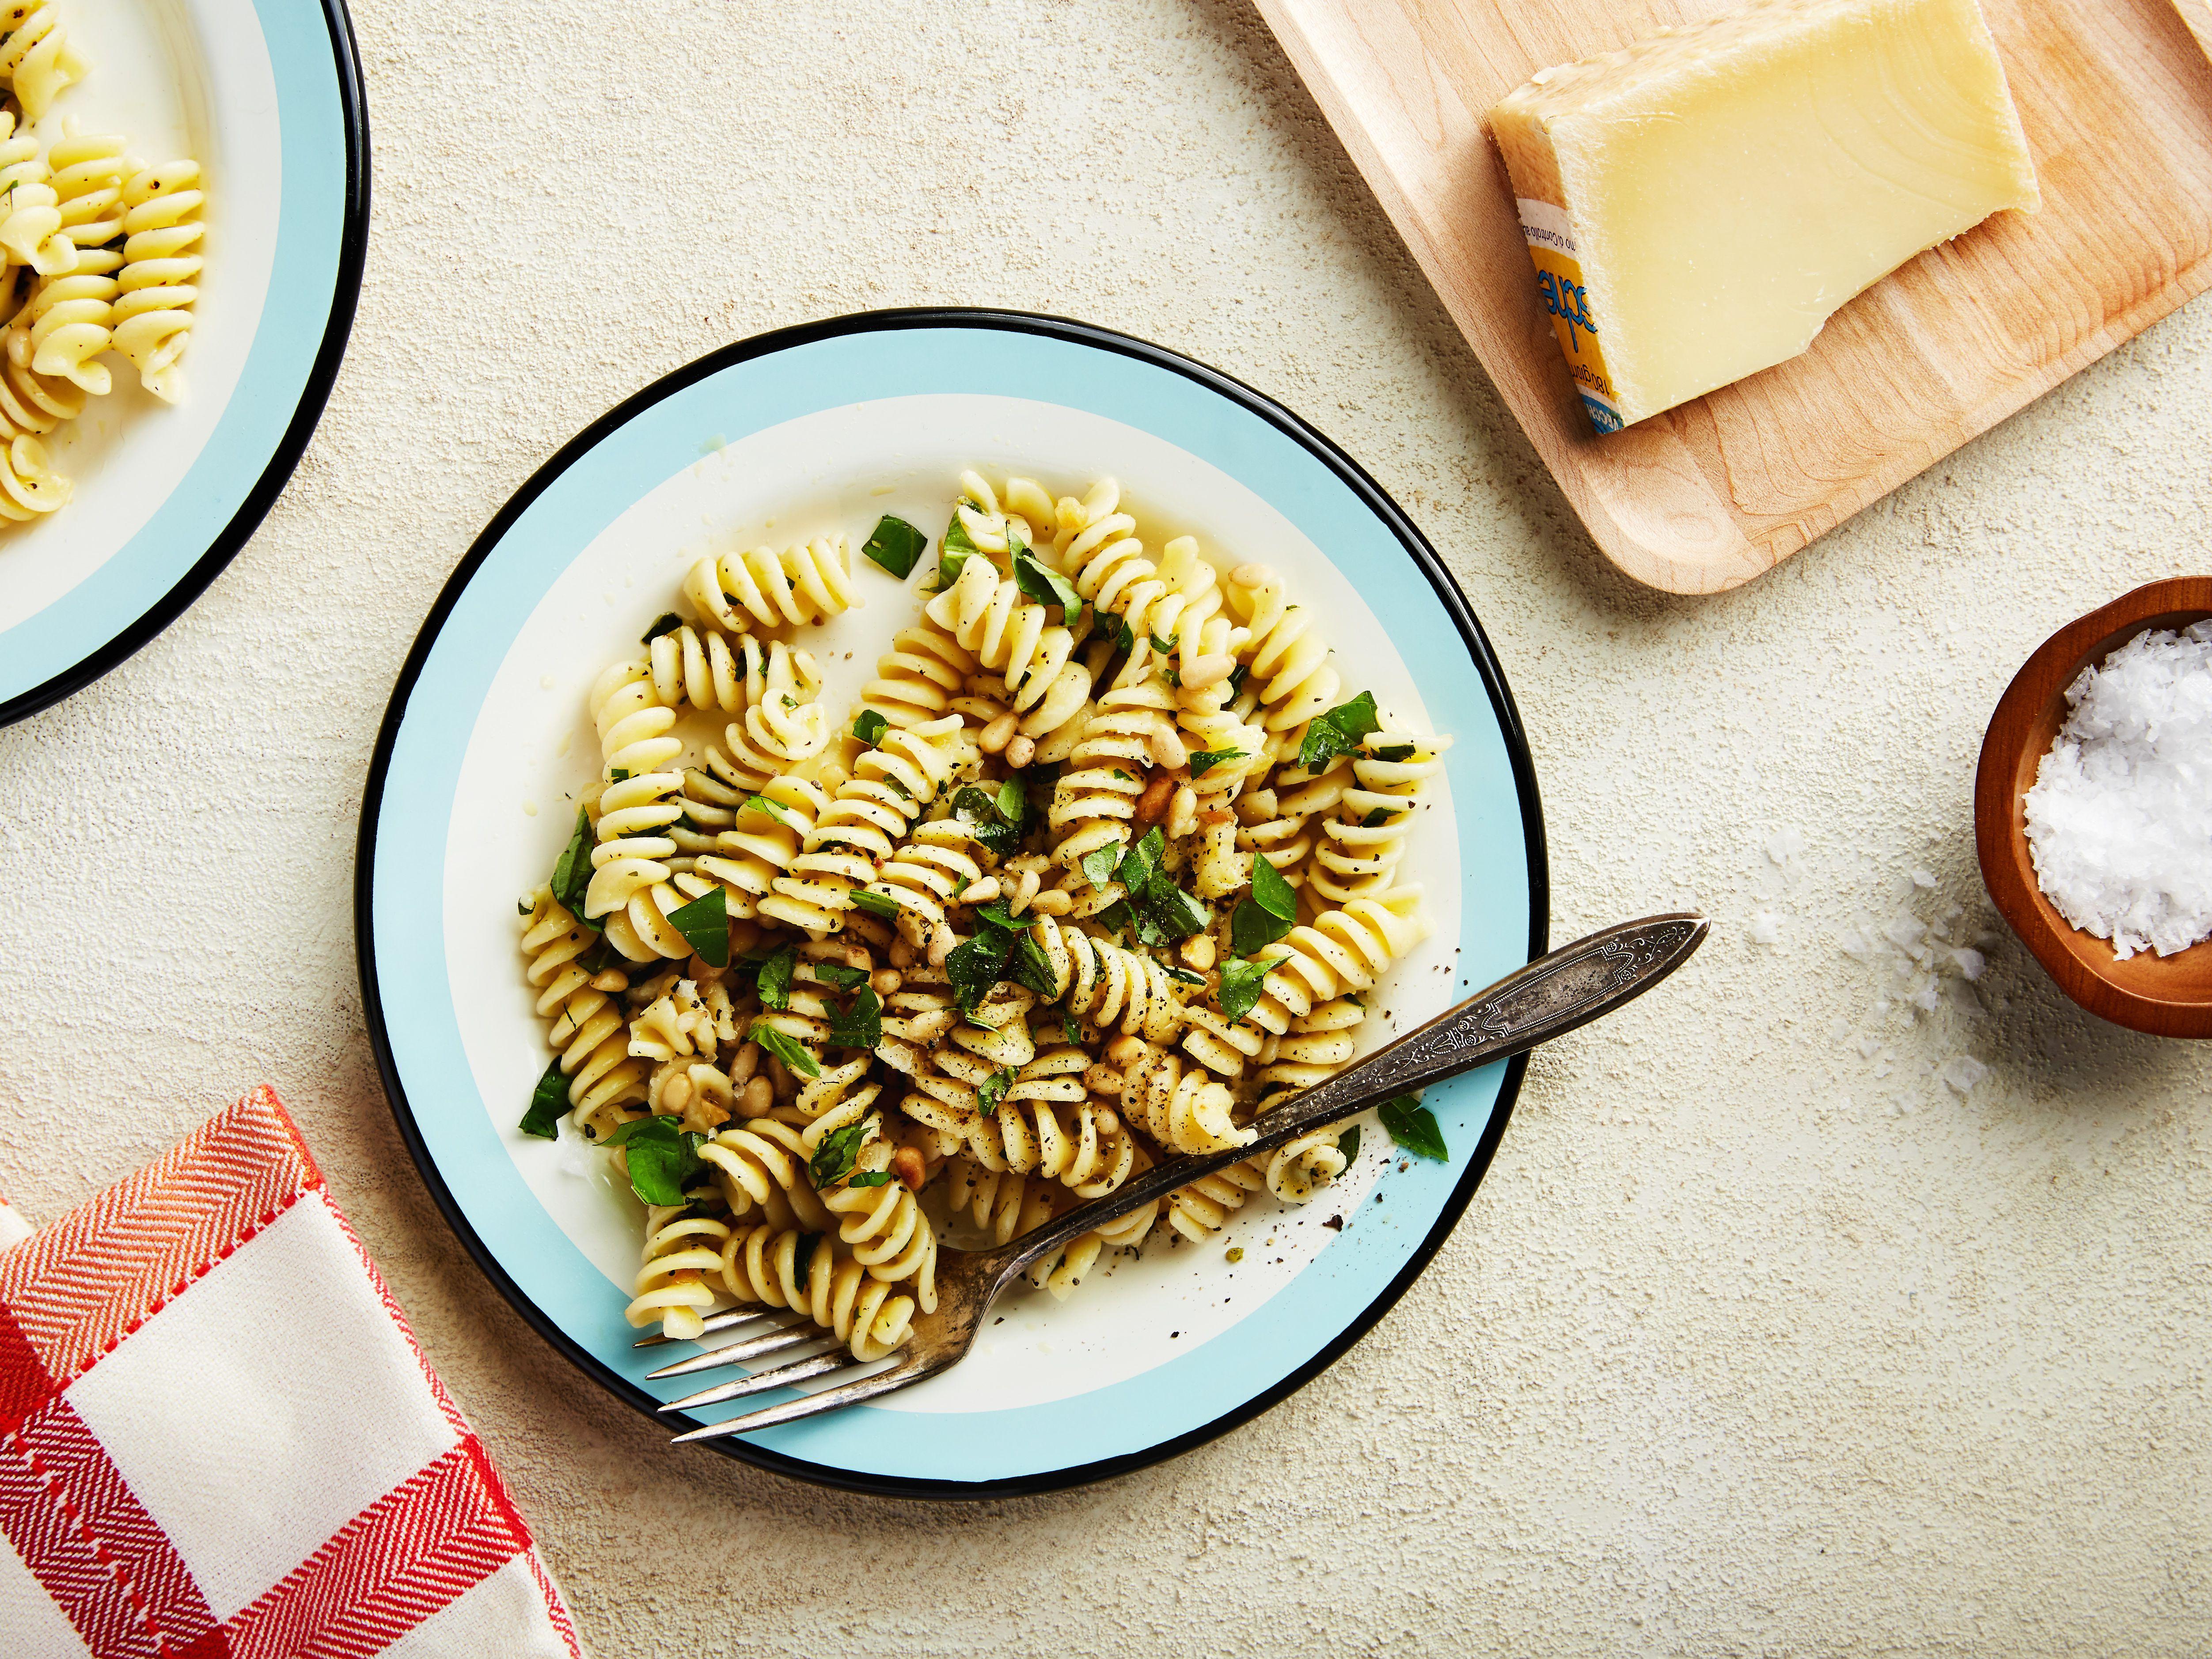 Easy Pasta Salad With Fresh Herbs Lemon And Garlic Recipe